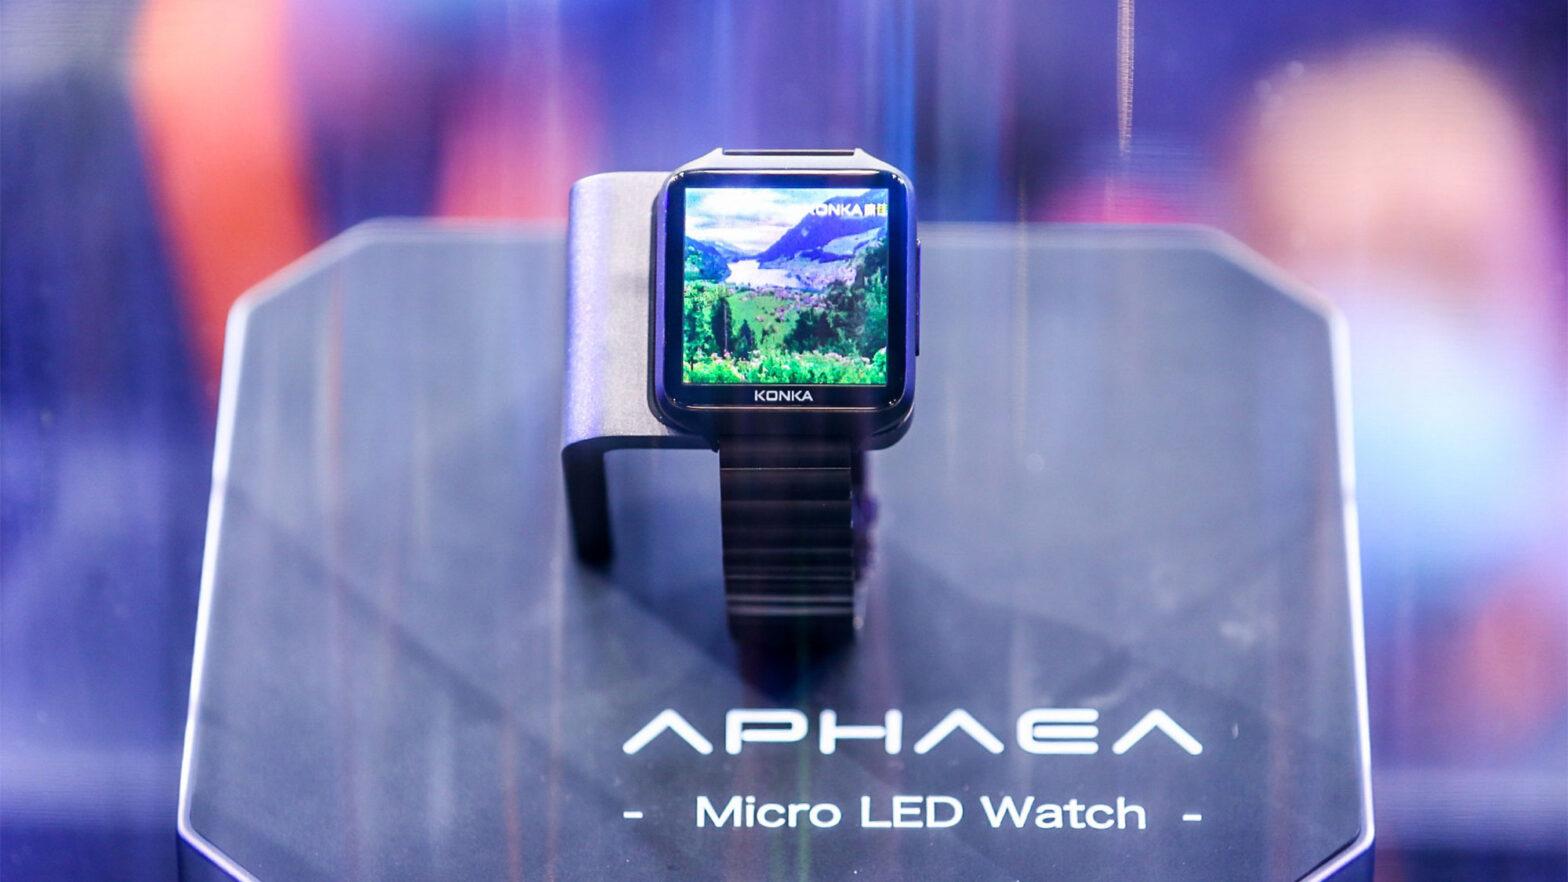 KONKA APHAEA Micro LED Watch